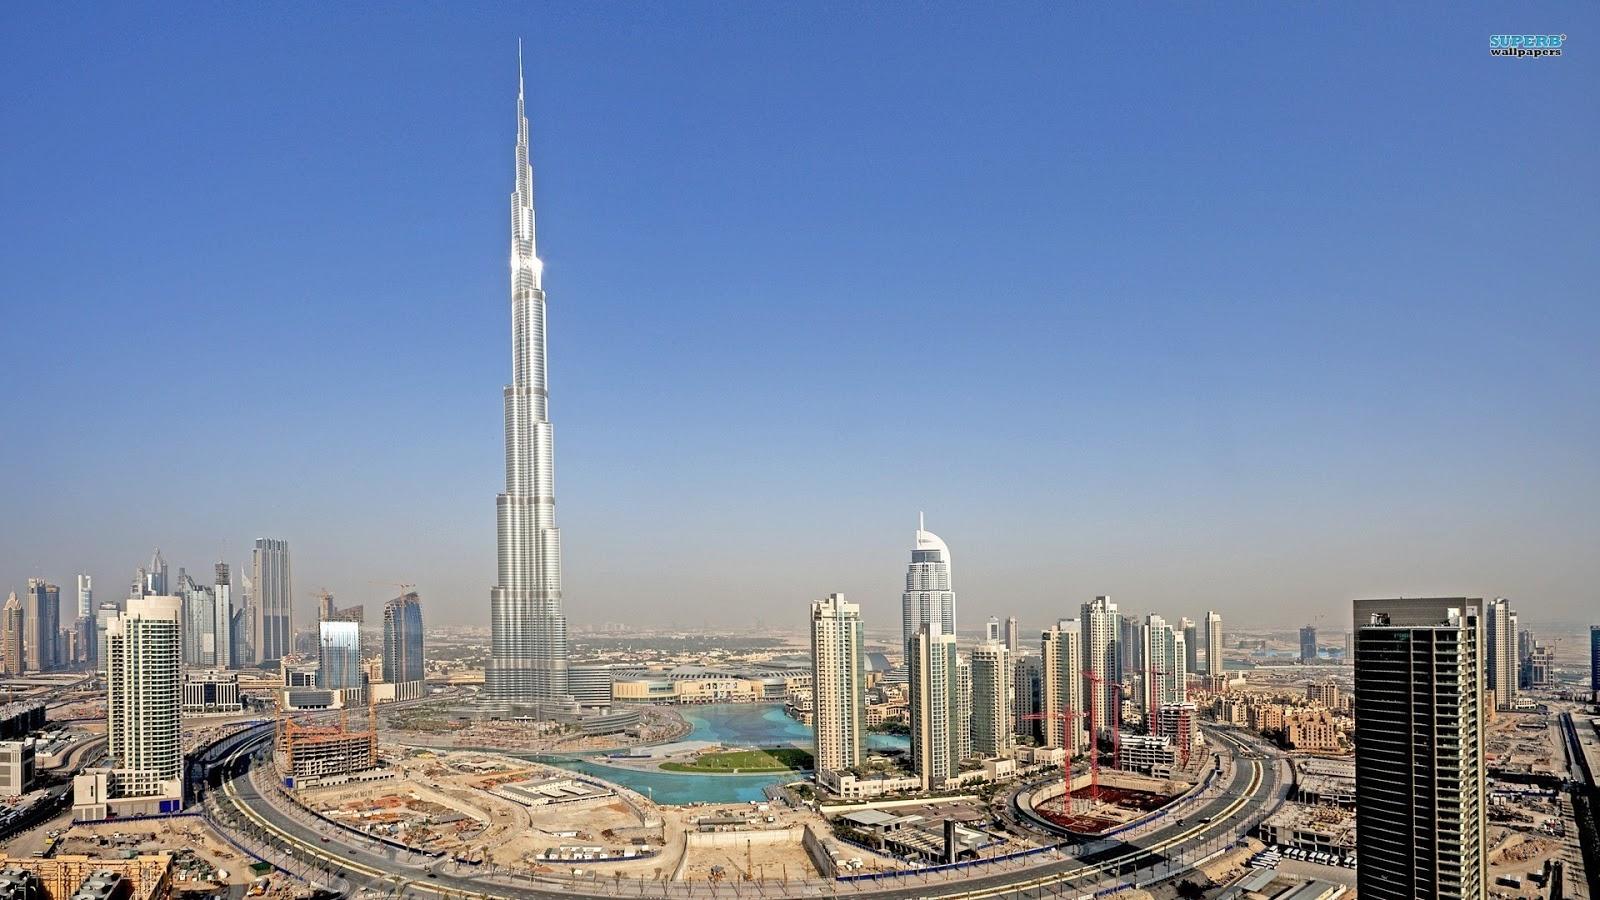 Building Construction Wallpaper Hd ₵ ℓƭ Ɛ T Ƨ Pr 233 Dio Mais Alto Do Mundo Burj Khalifa